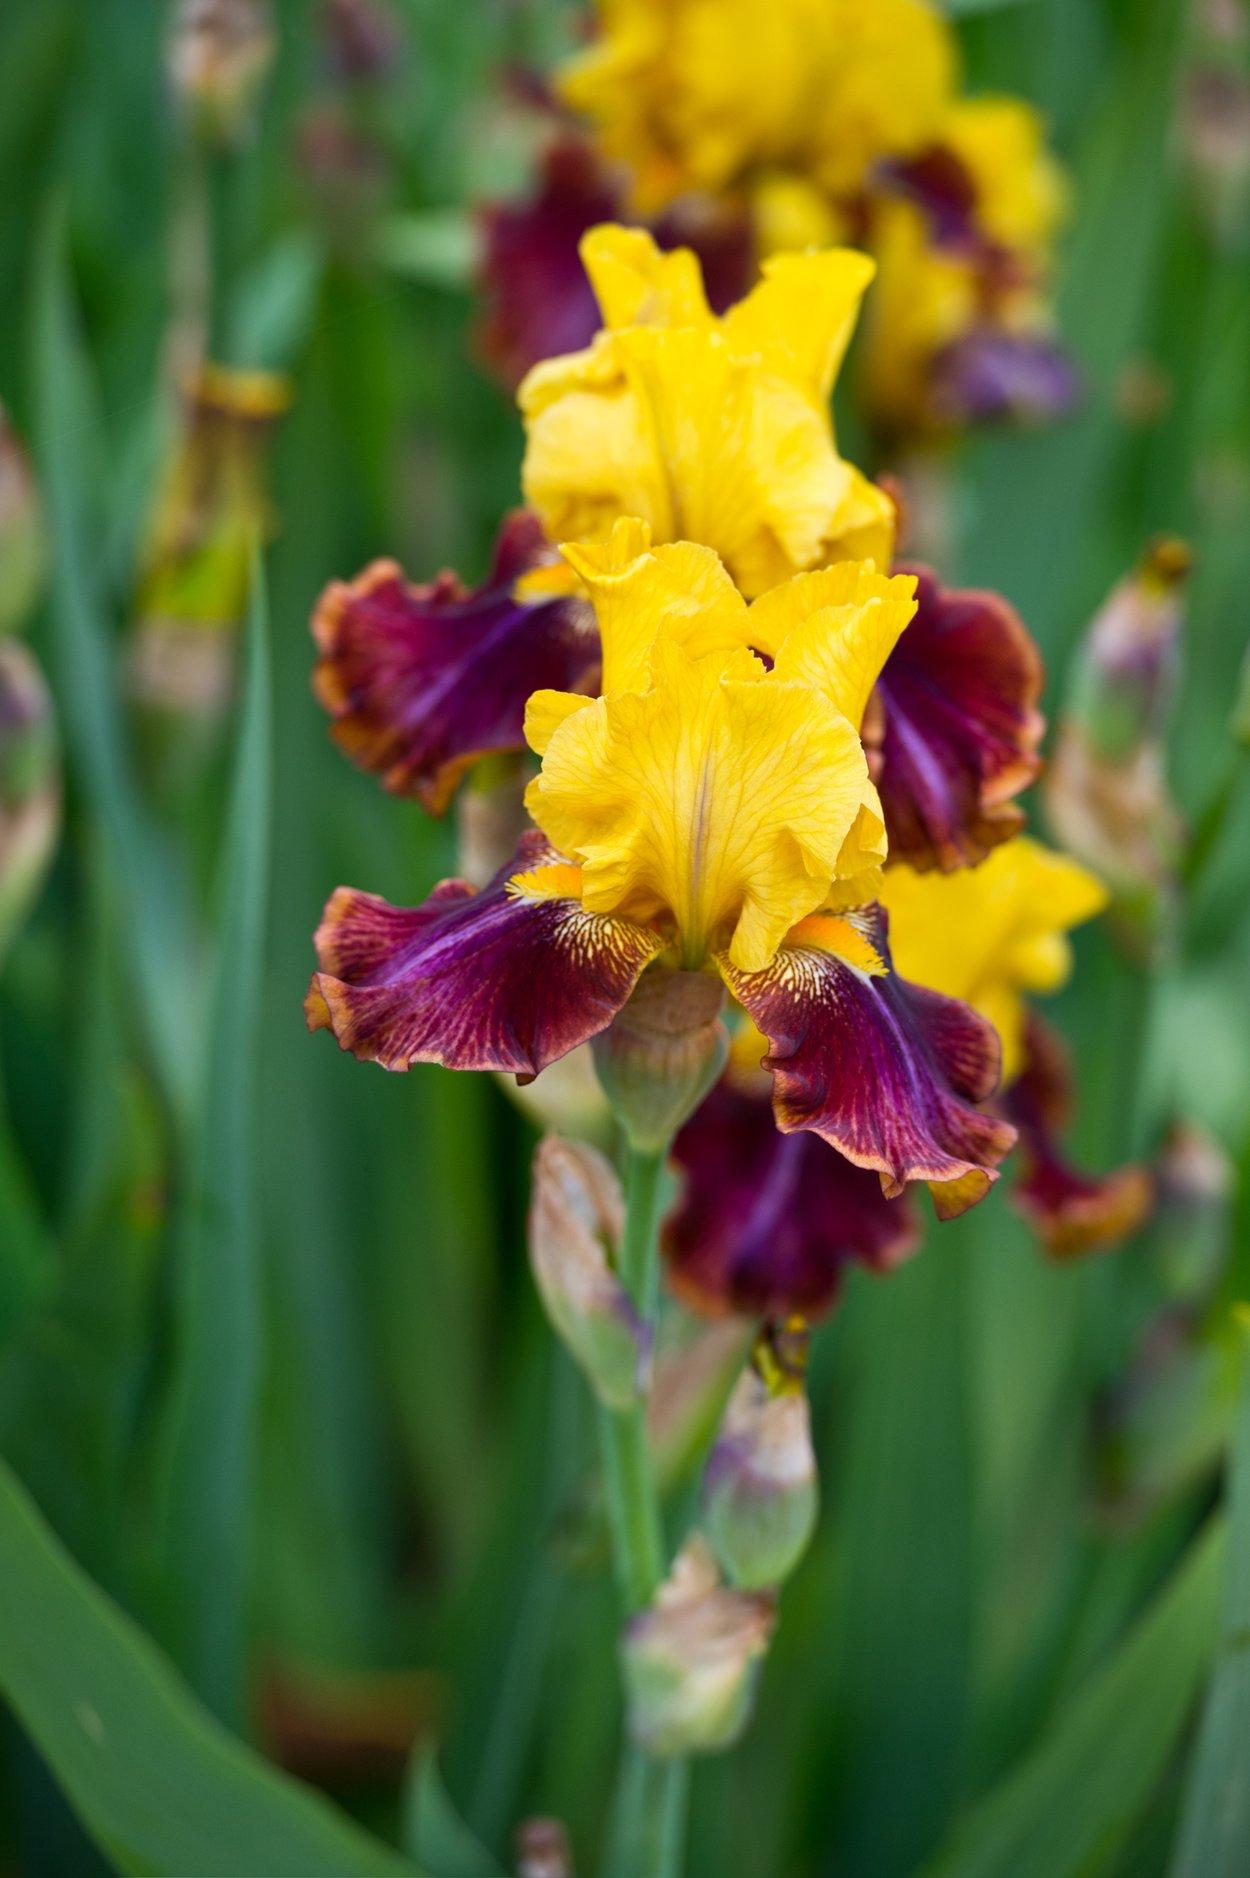 Iris Bedeutung: Bunte Iris